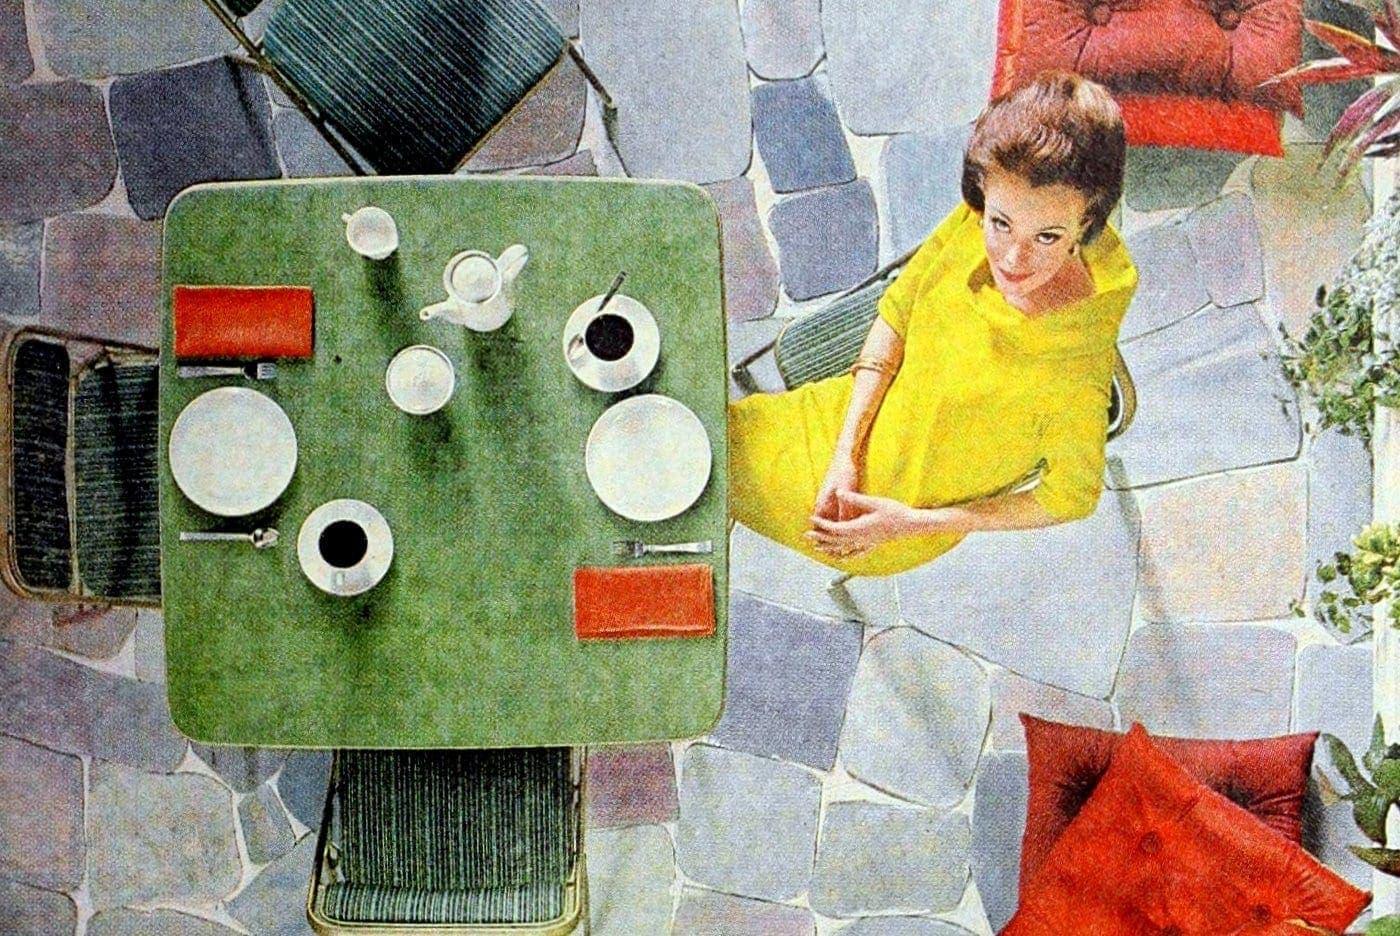 See vintage card tables